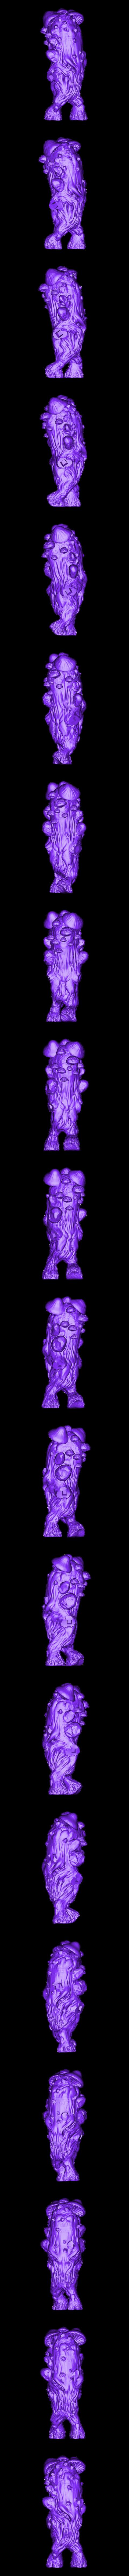 Mushroom_body.stl Download free STL file Mushroom man • 3D printer design, duncanshadow